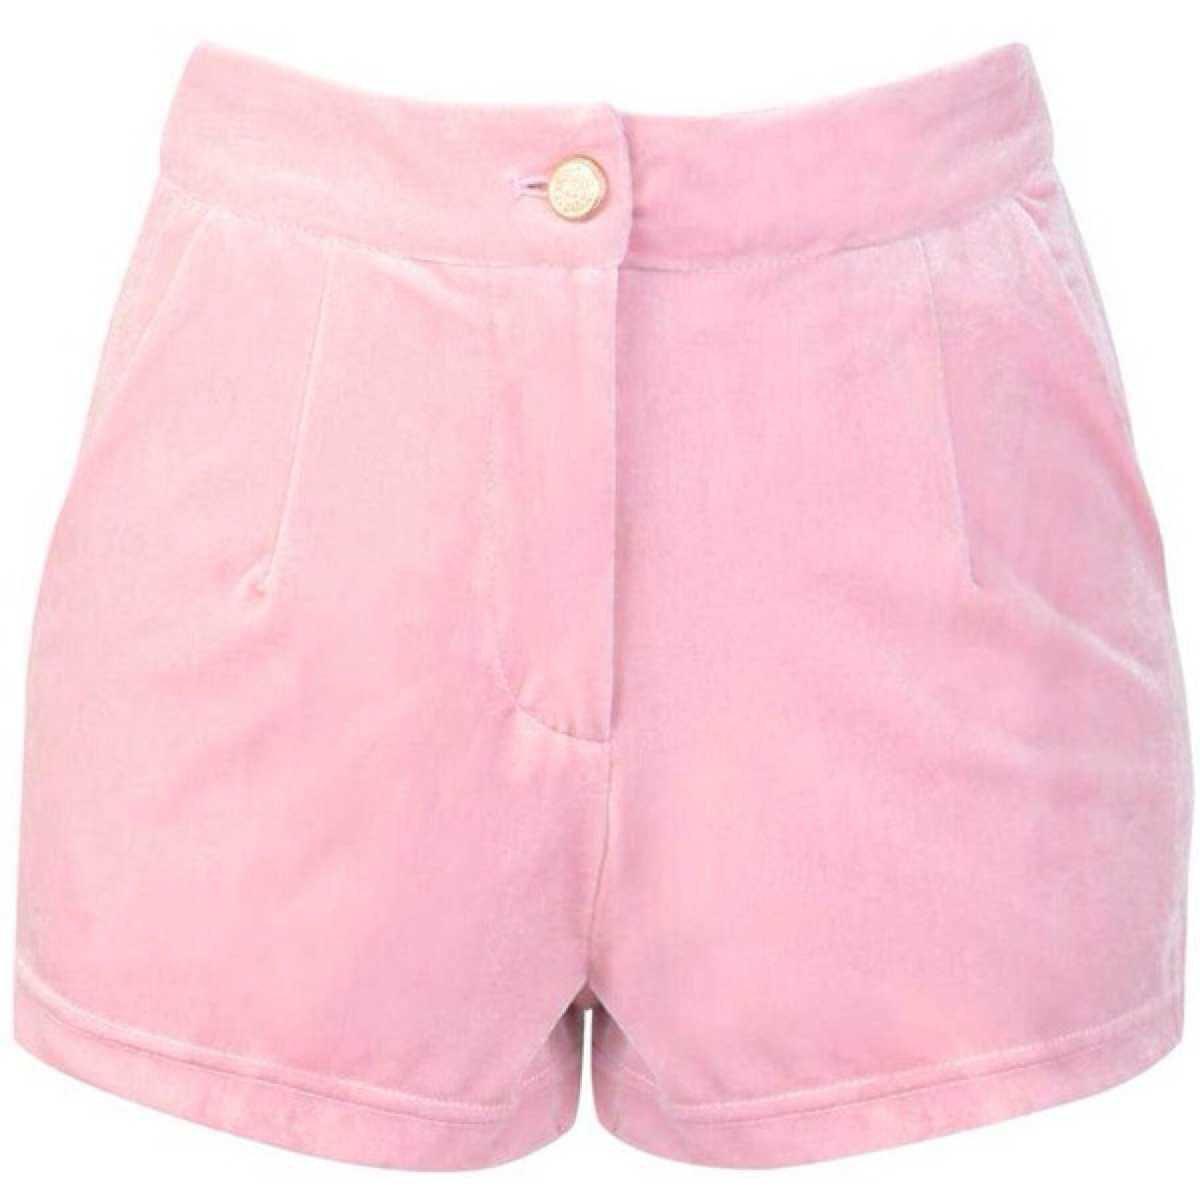 pink shortss